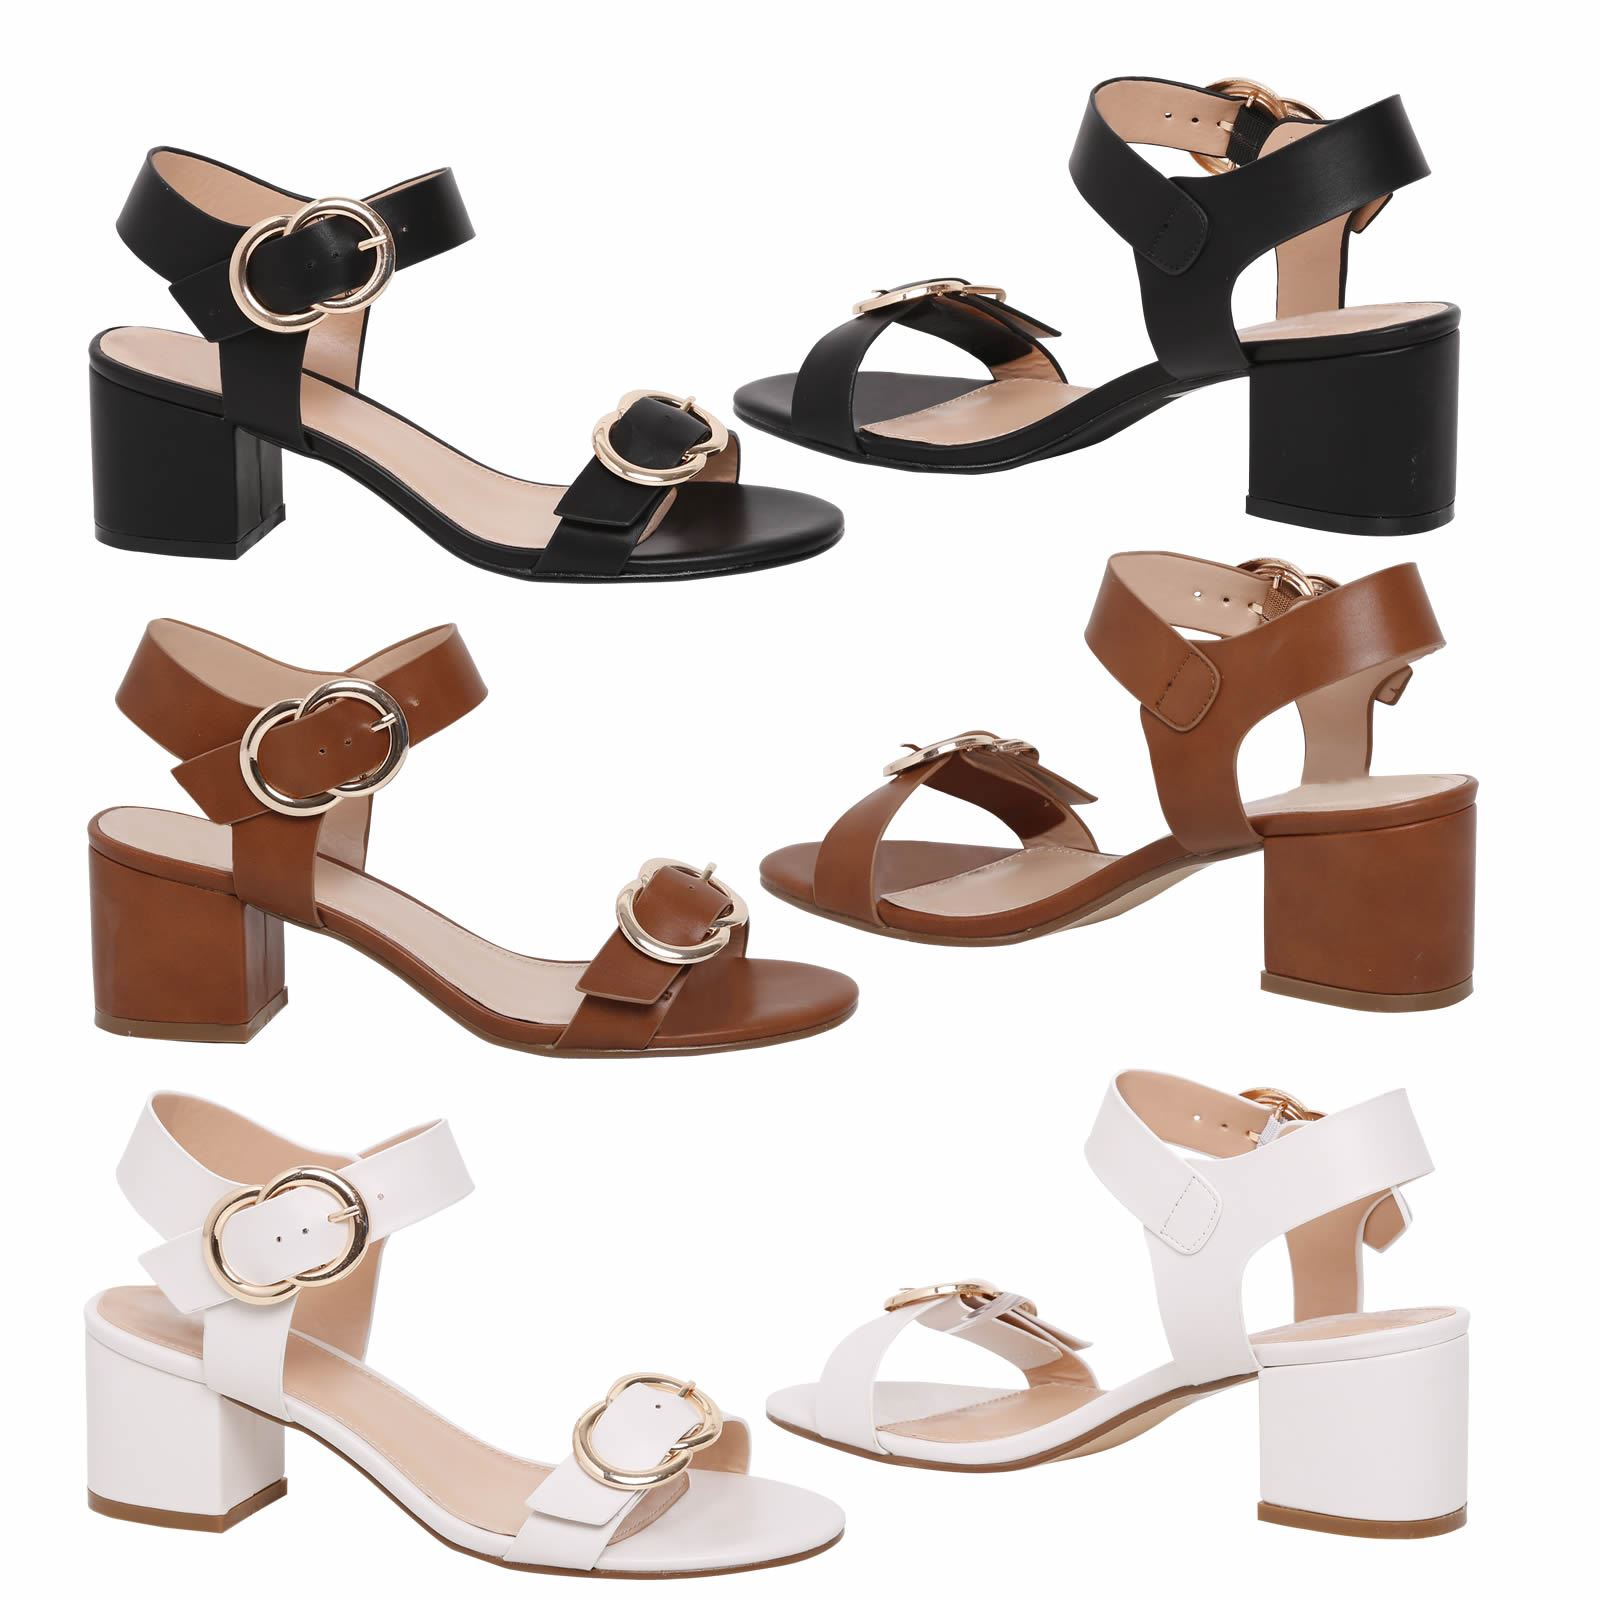 11a7945ffbf Details about Amora Womens Low Mid Block Heels Buckle Detail Peep Toe  Sandals Ladies Size